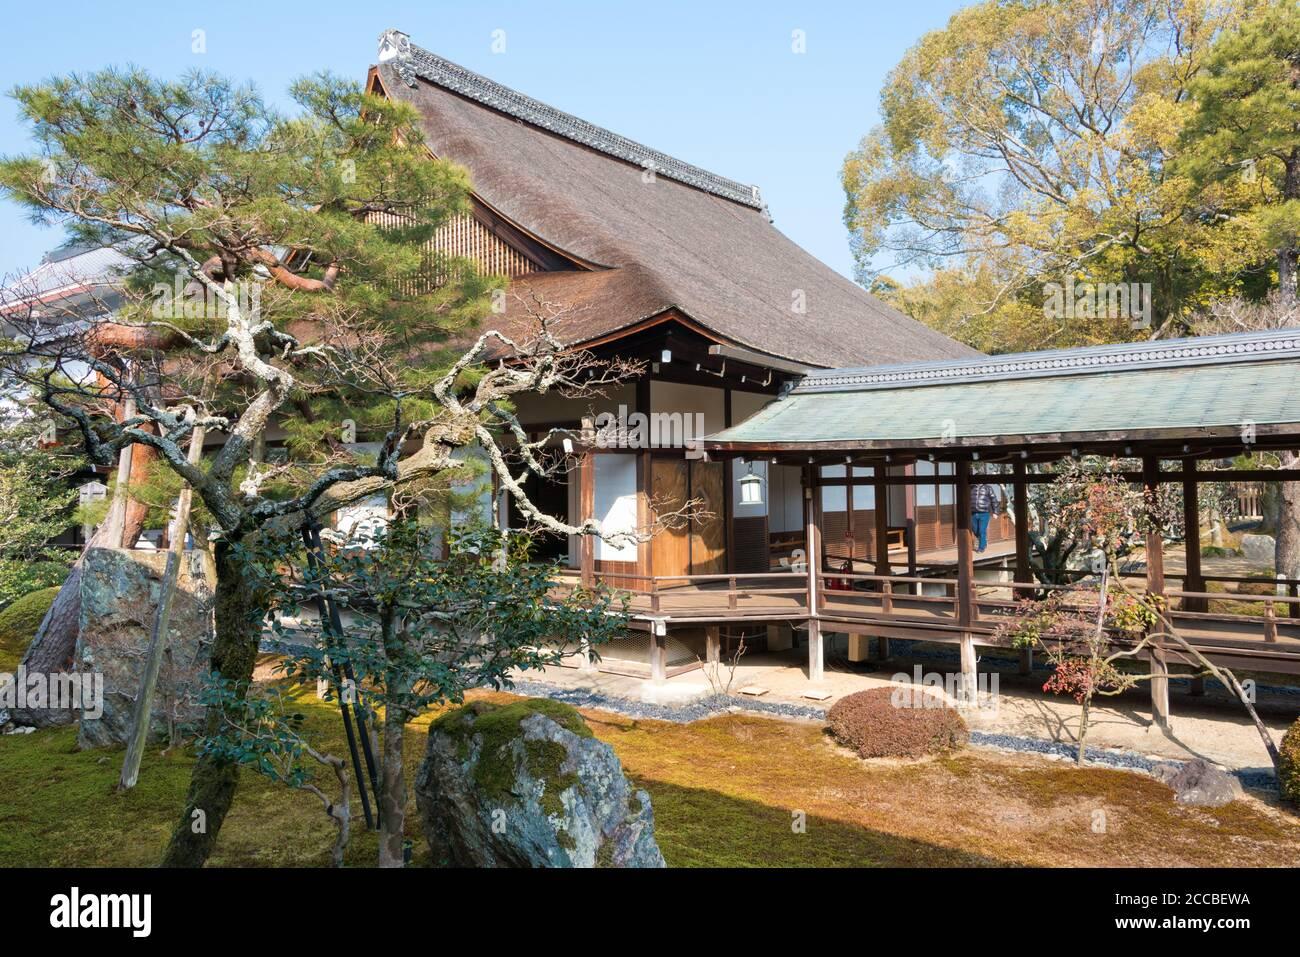 Kyoto, Japan - Daikaku-ji Temple in Kyoto, Japan. The site was originally a residence of Emperor Saga (786-842). Stock Photo